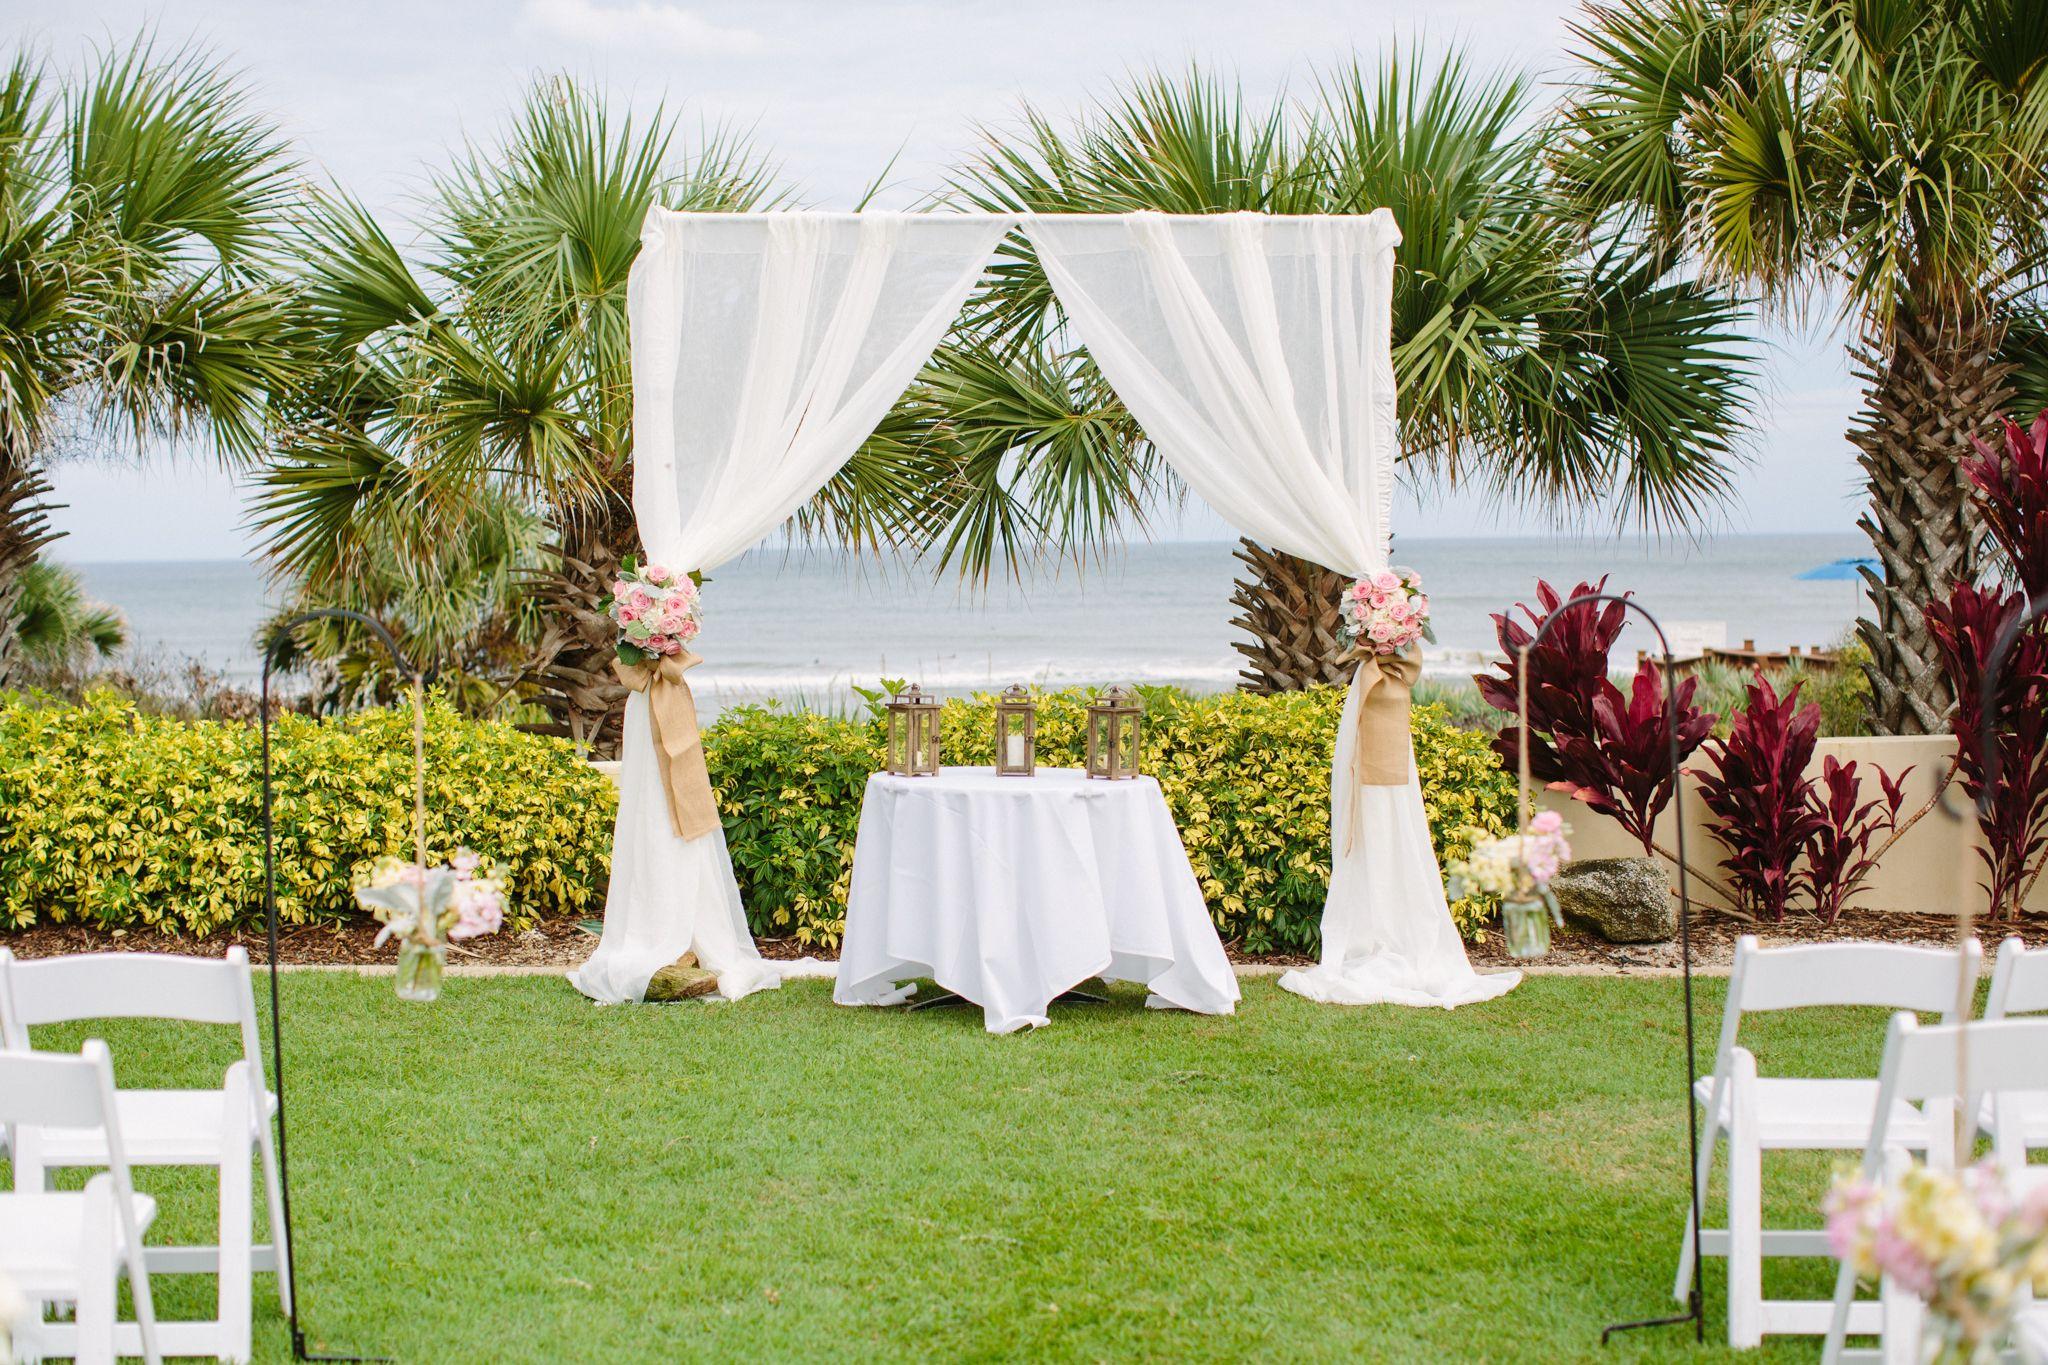 November Wedding on Lodge Event Lawn at Hammock Beach